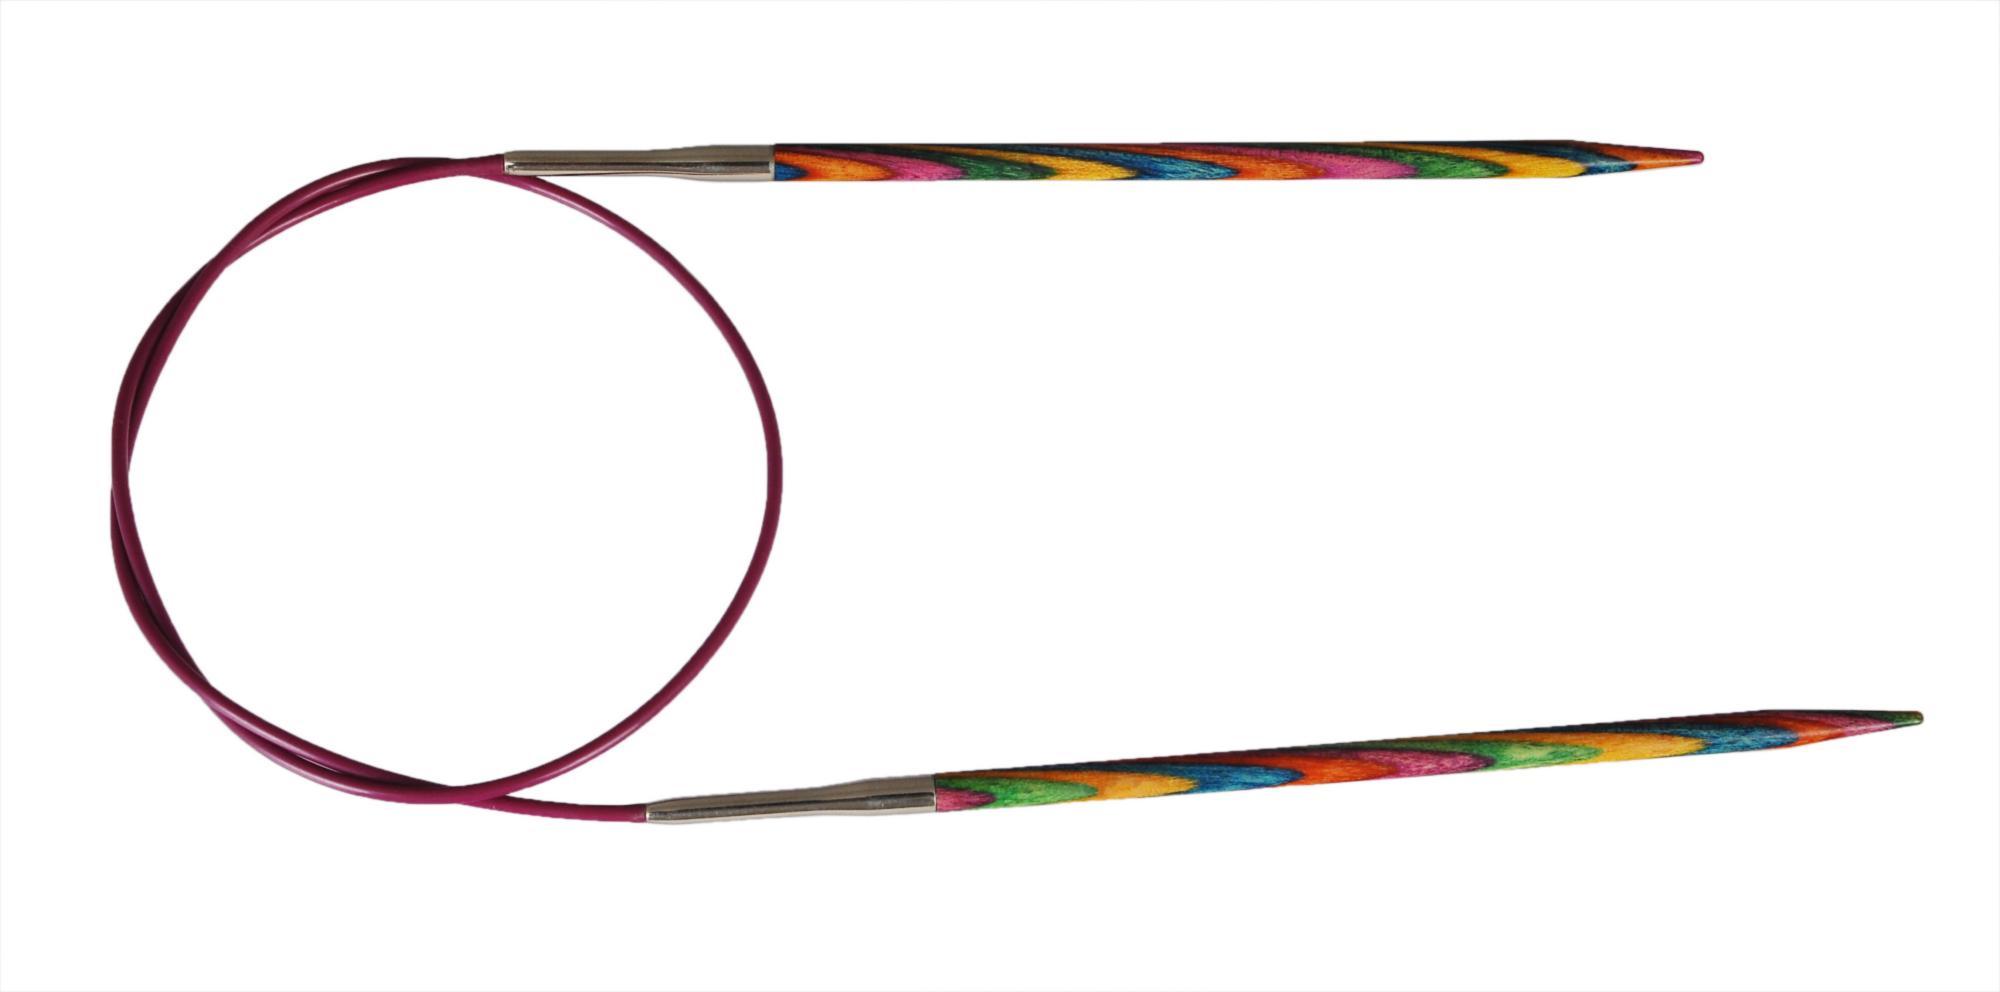 Спицы круговые 50 см Symfonie Wood KnitPro, 20385, 3.00 мм